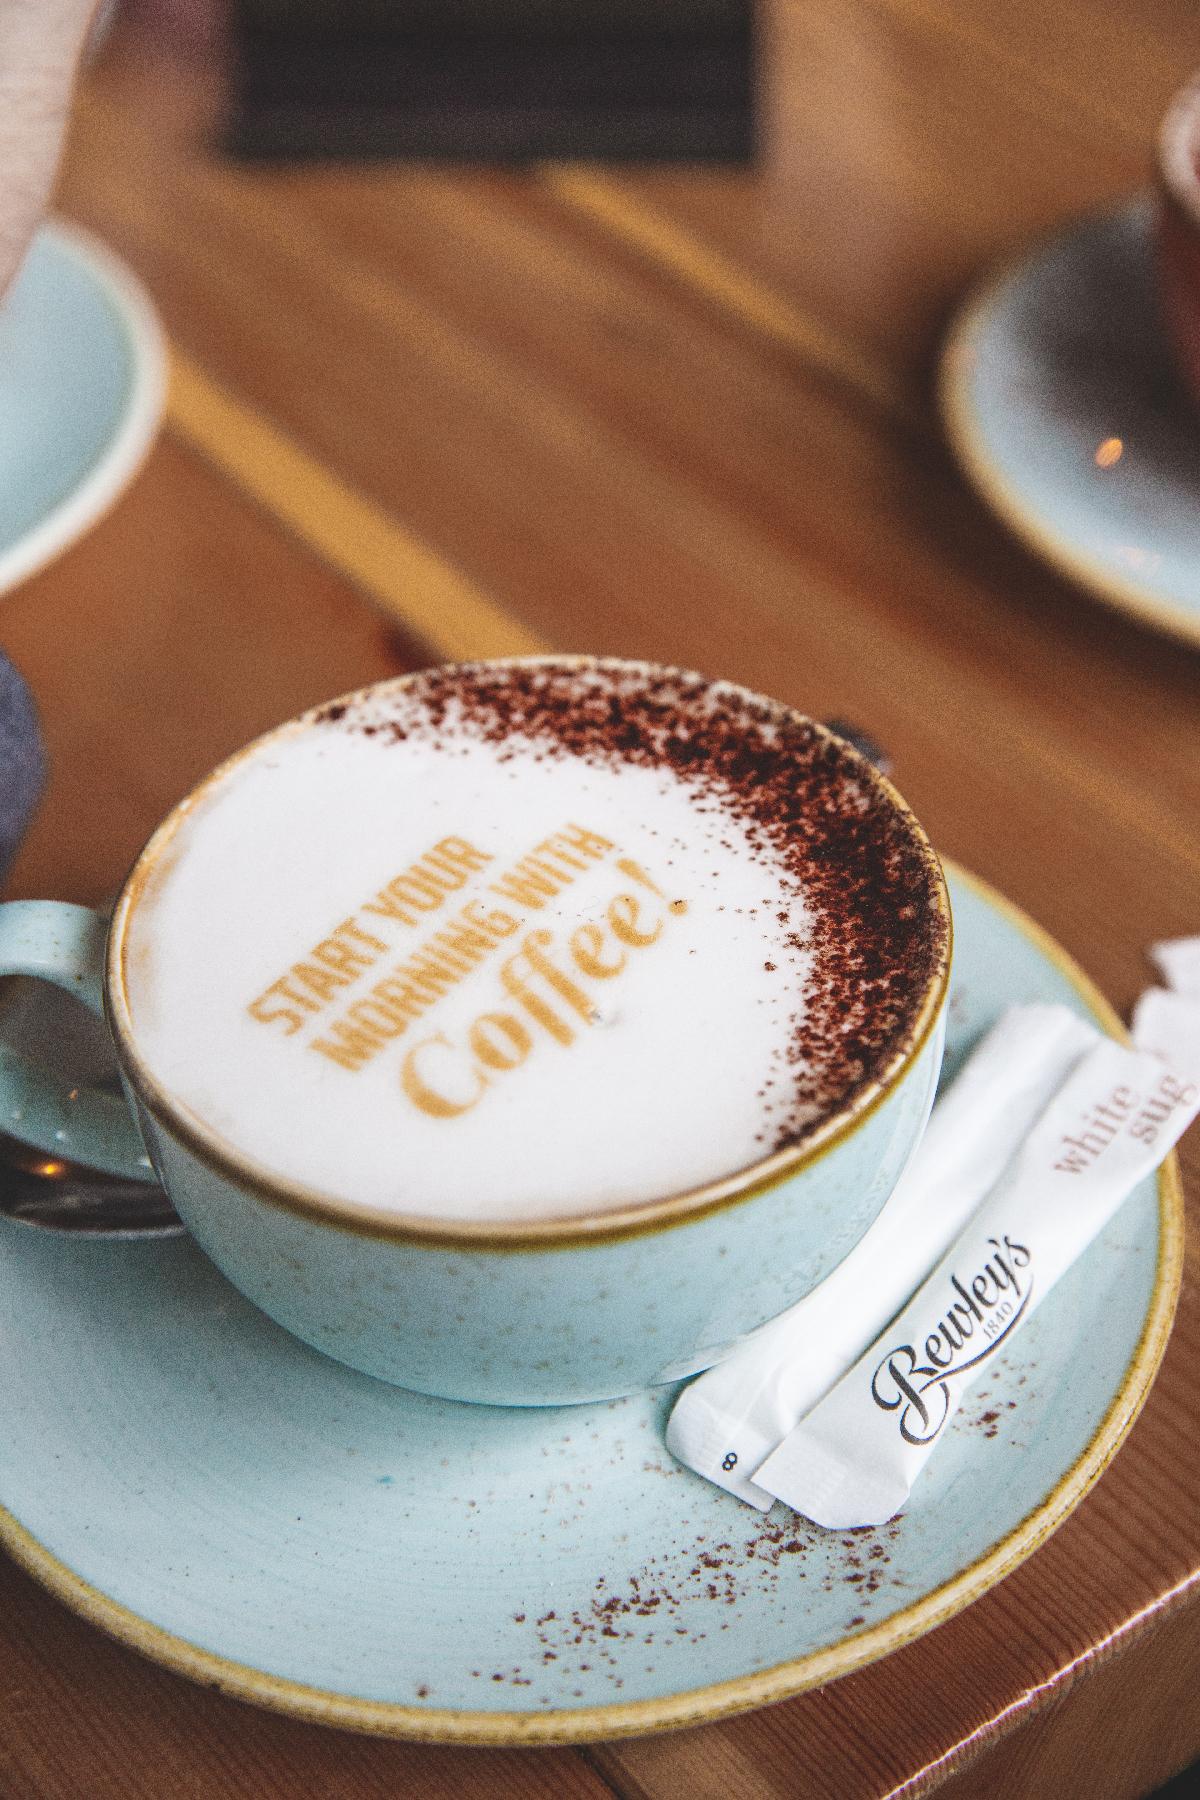 JM Reidys Coffee in Ireland